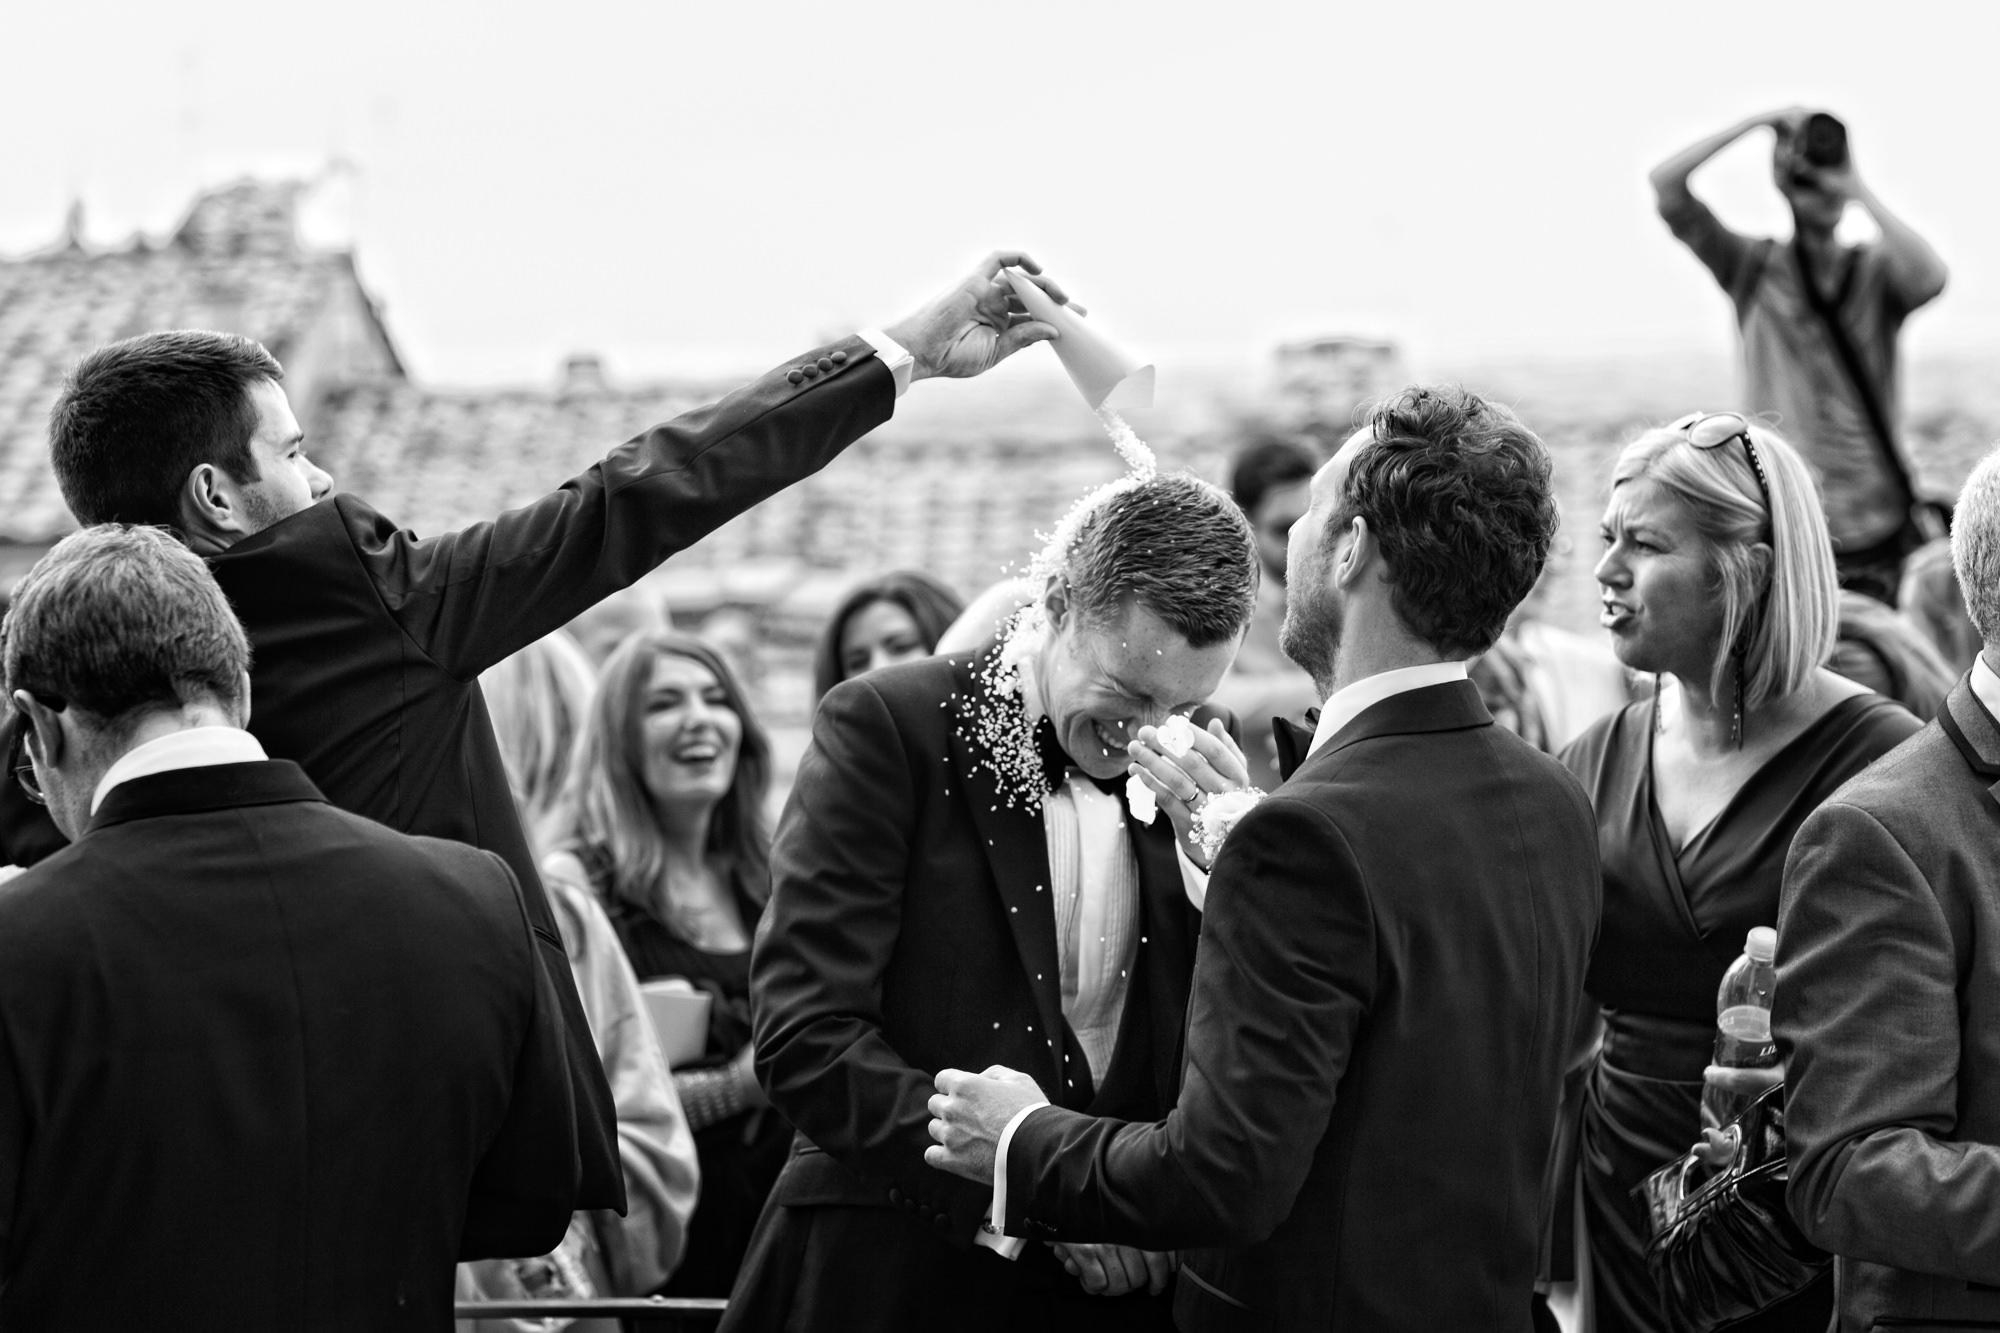 Fun moment with groom photo by David Bastianoni